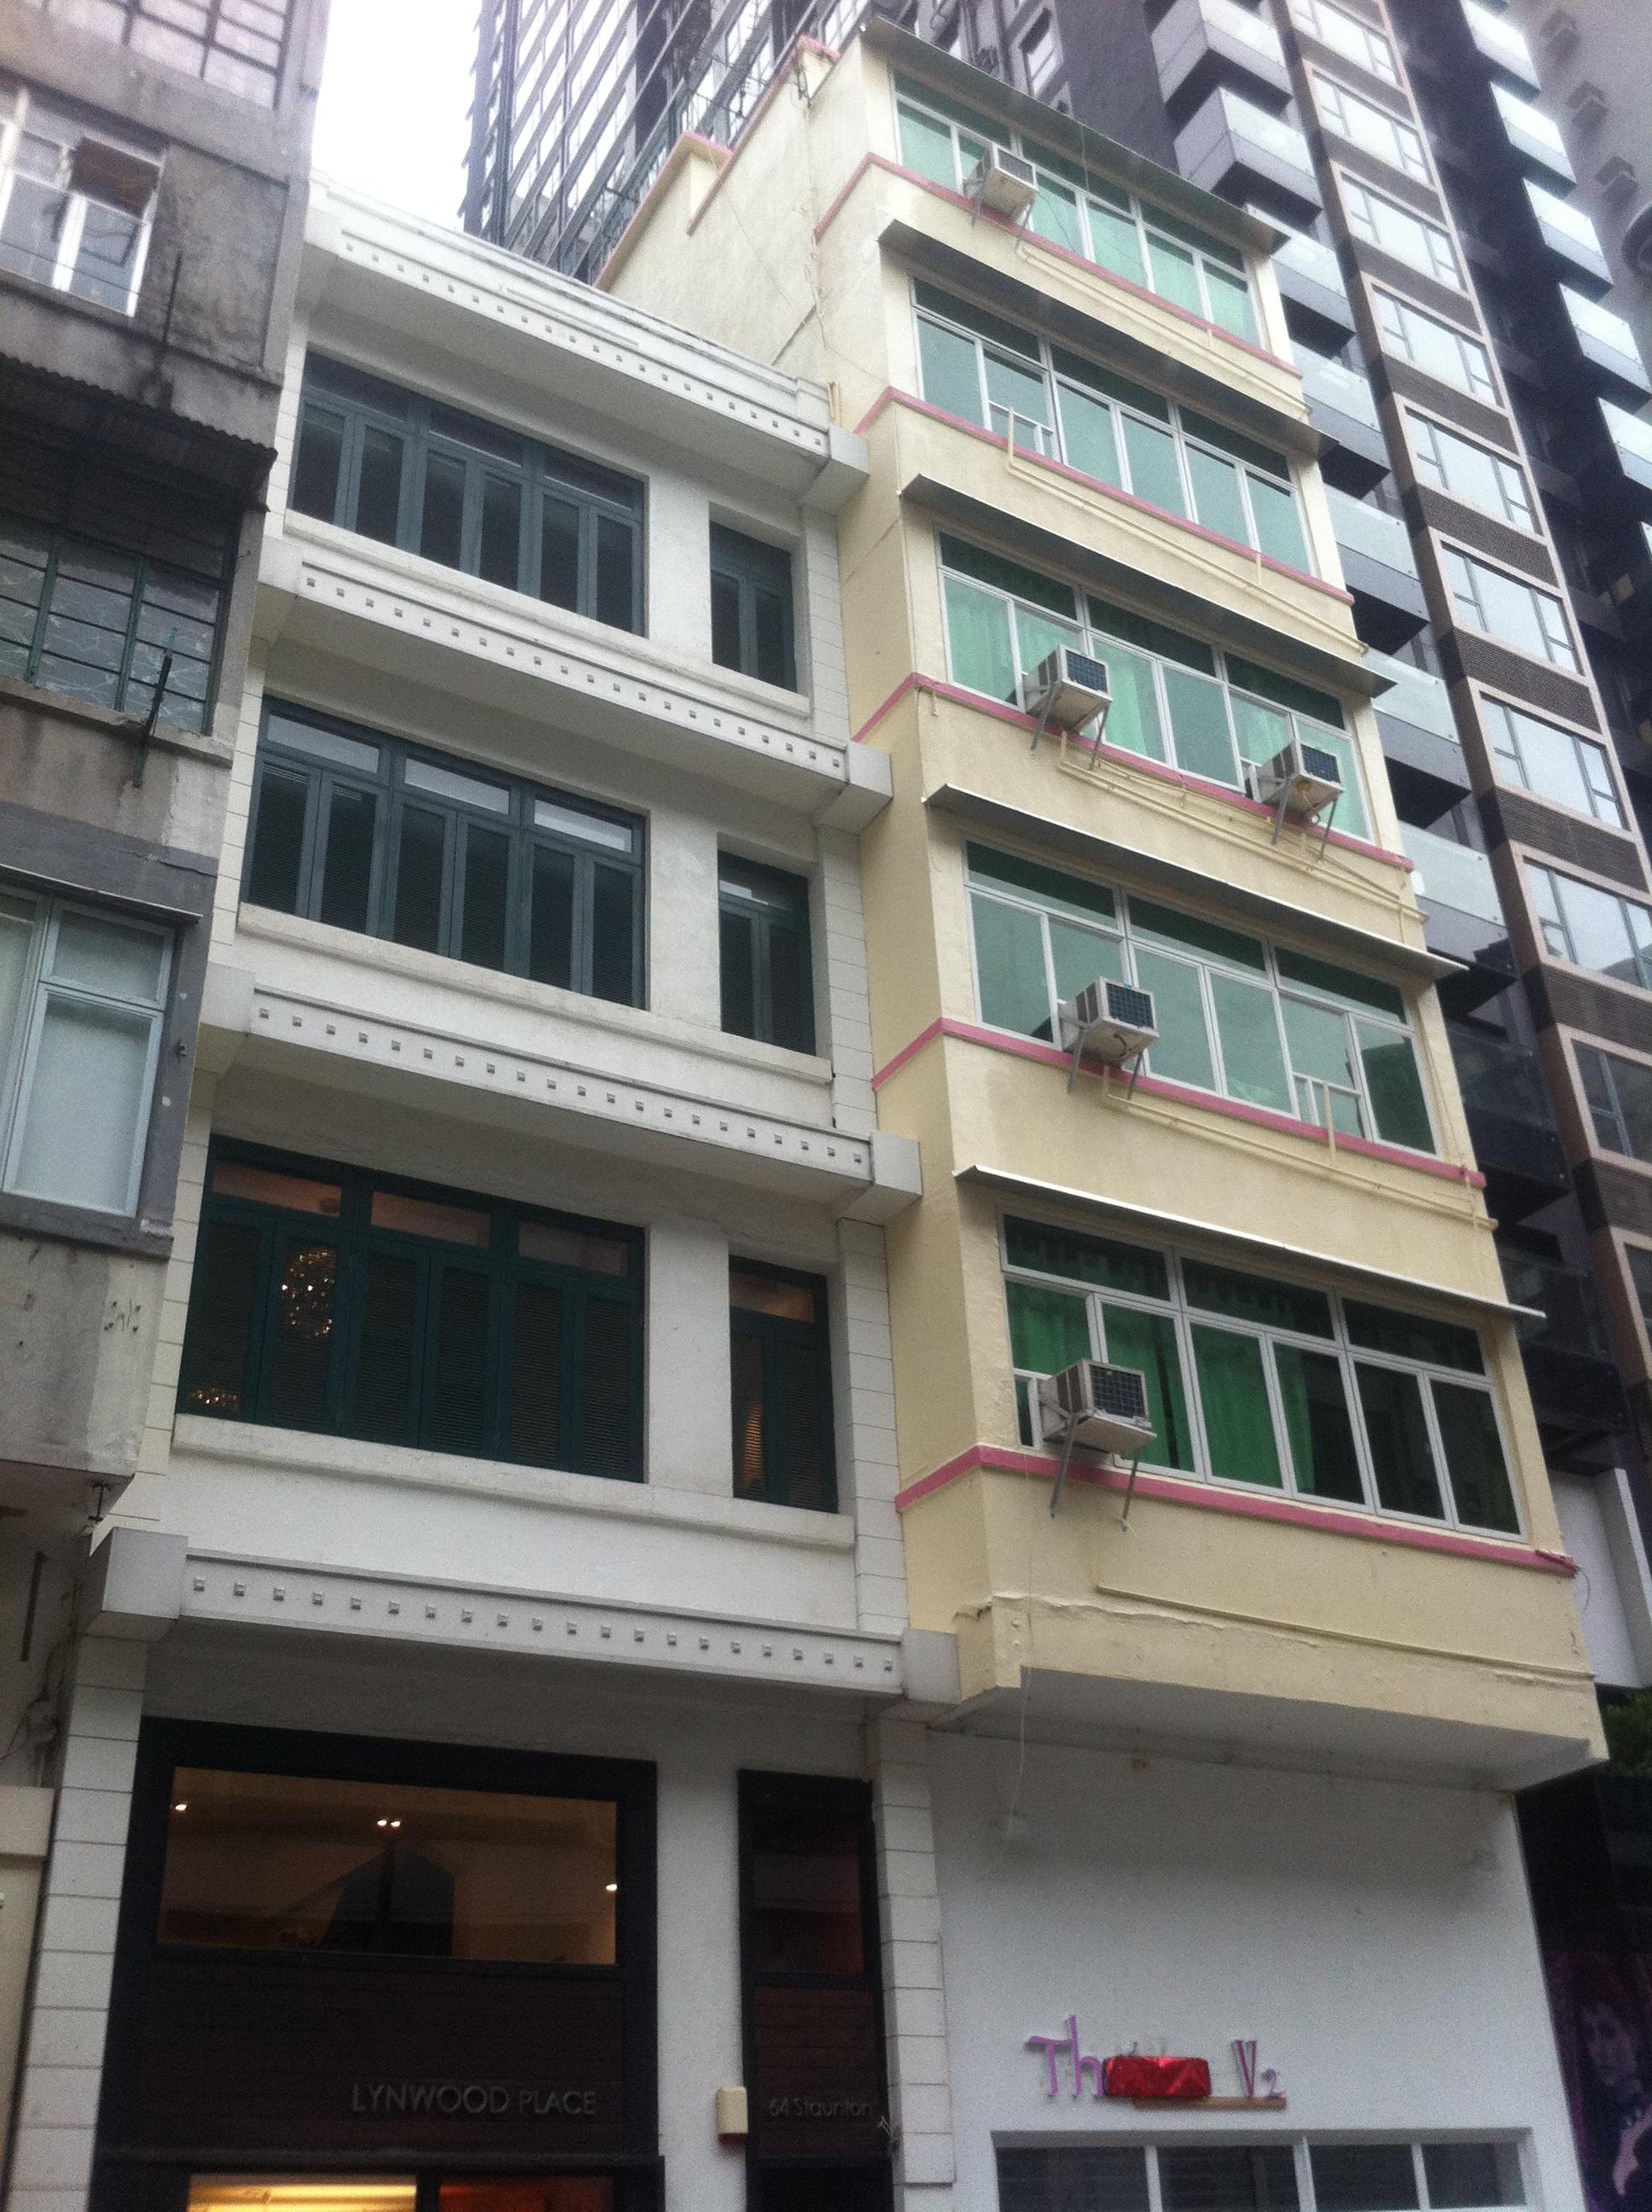 File:HK 上環 Sheung Wan 士丹頓街 64 Staunton Street facade Jan-2012.jpg - Wikimedia Commons